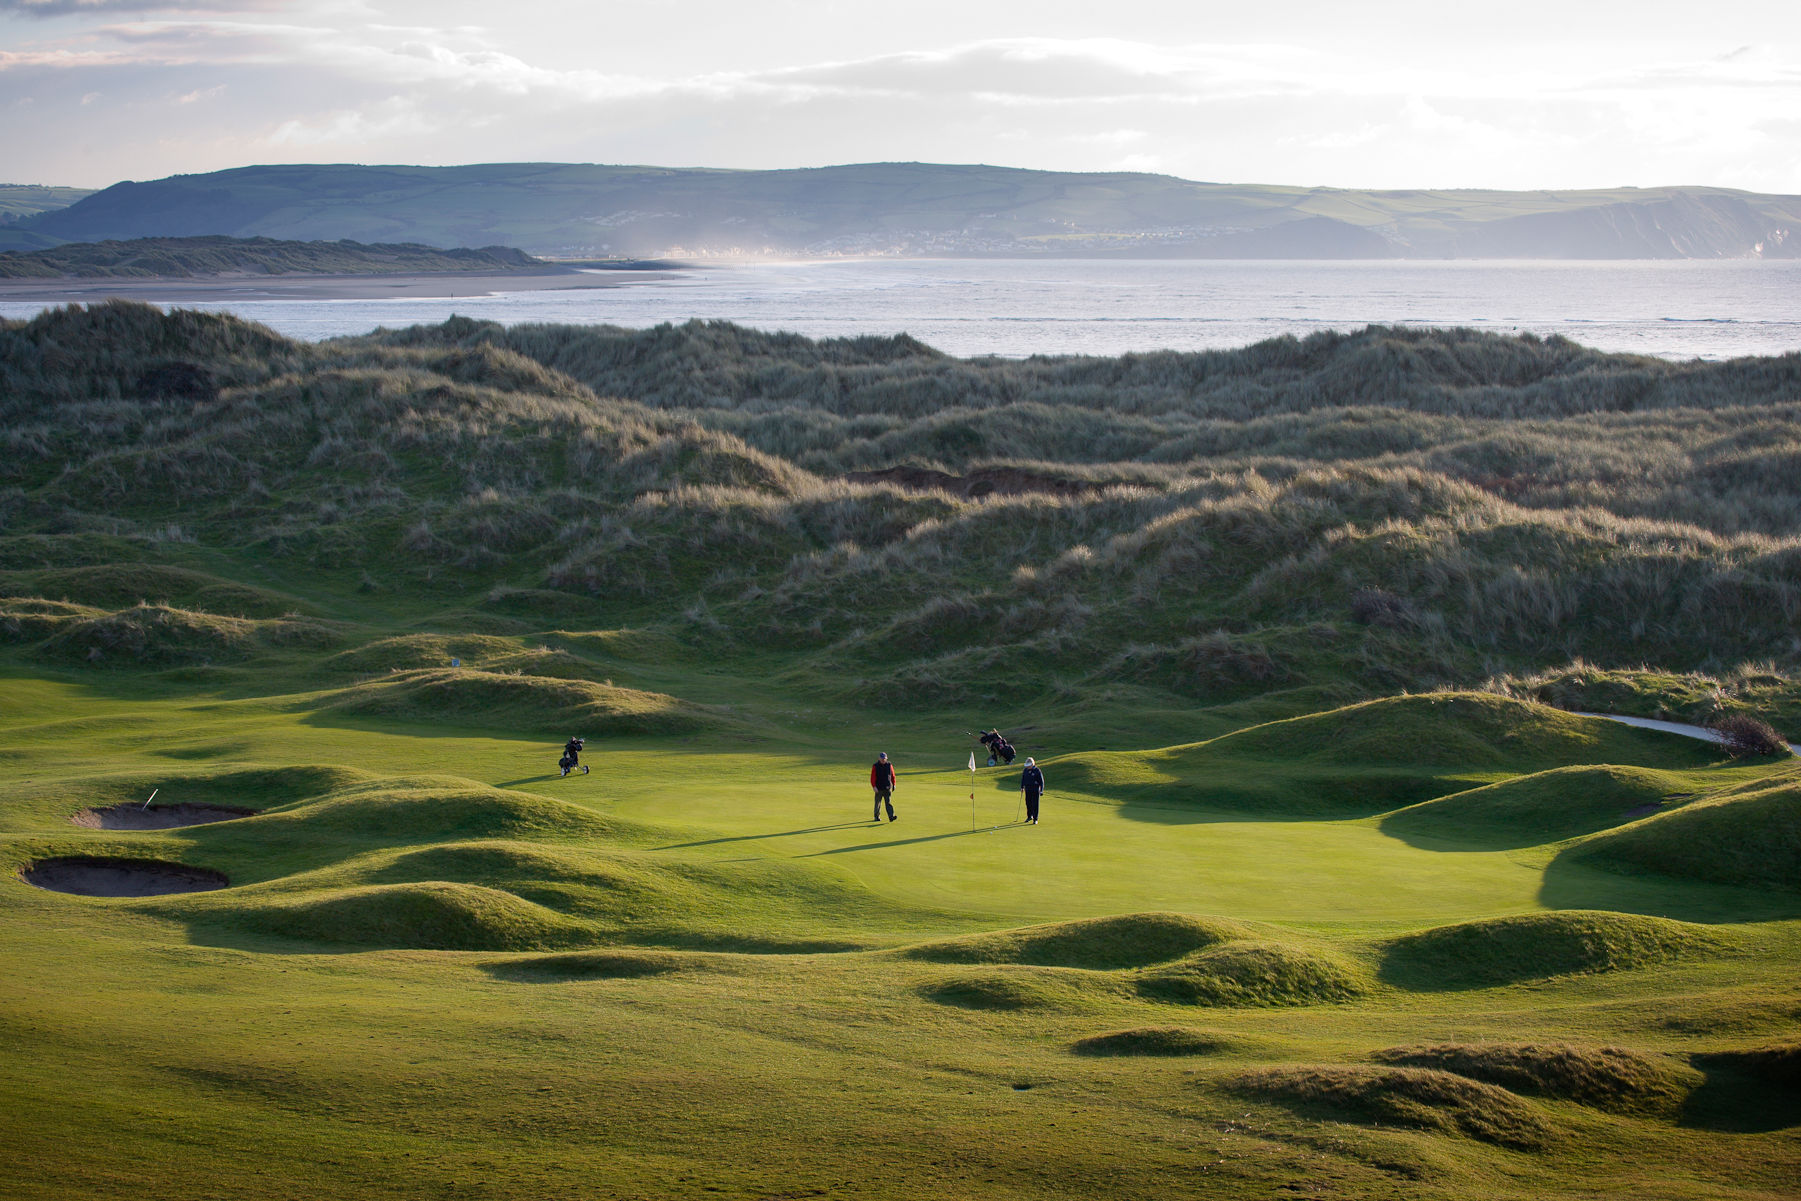 Aberdovey golf club cover picture